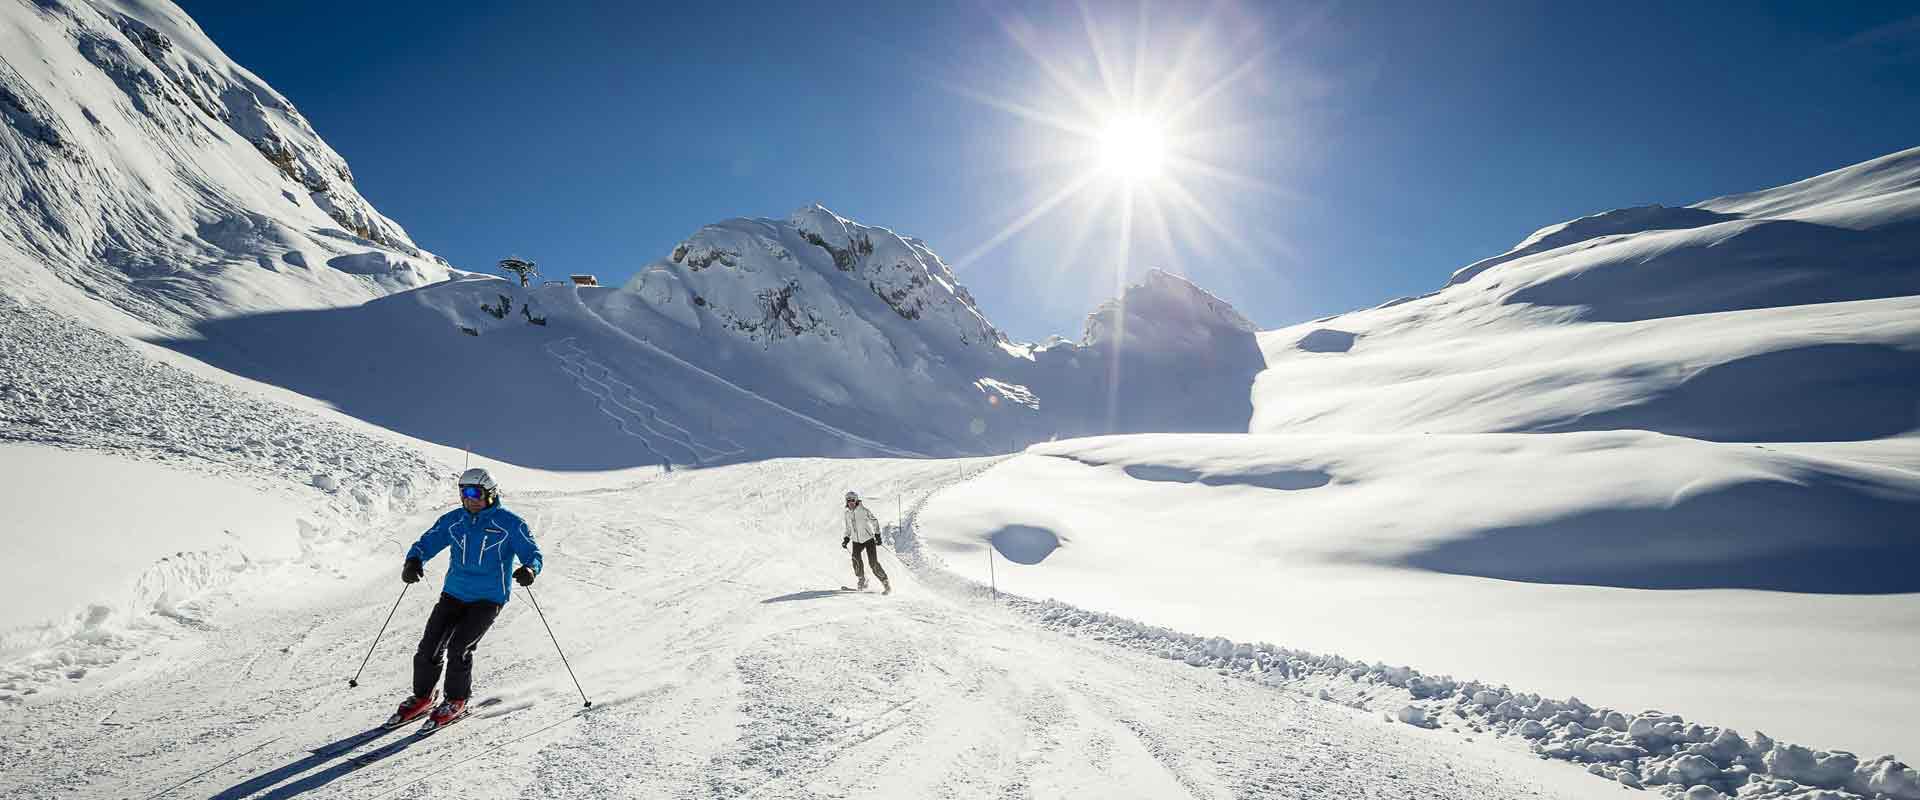 ski-area-lagazuoi-5-torri